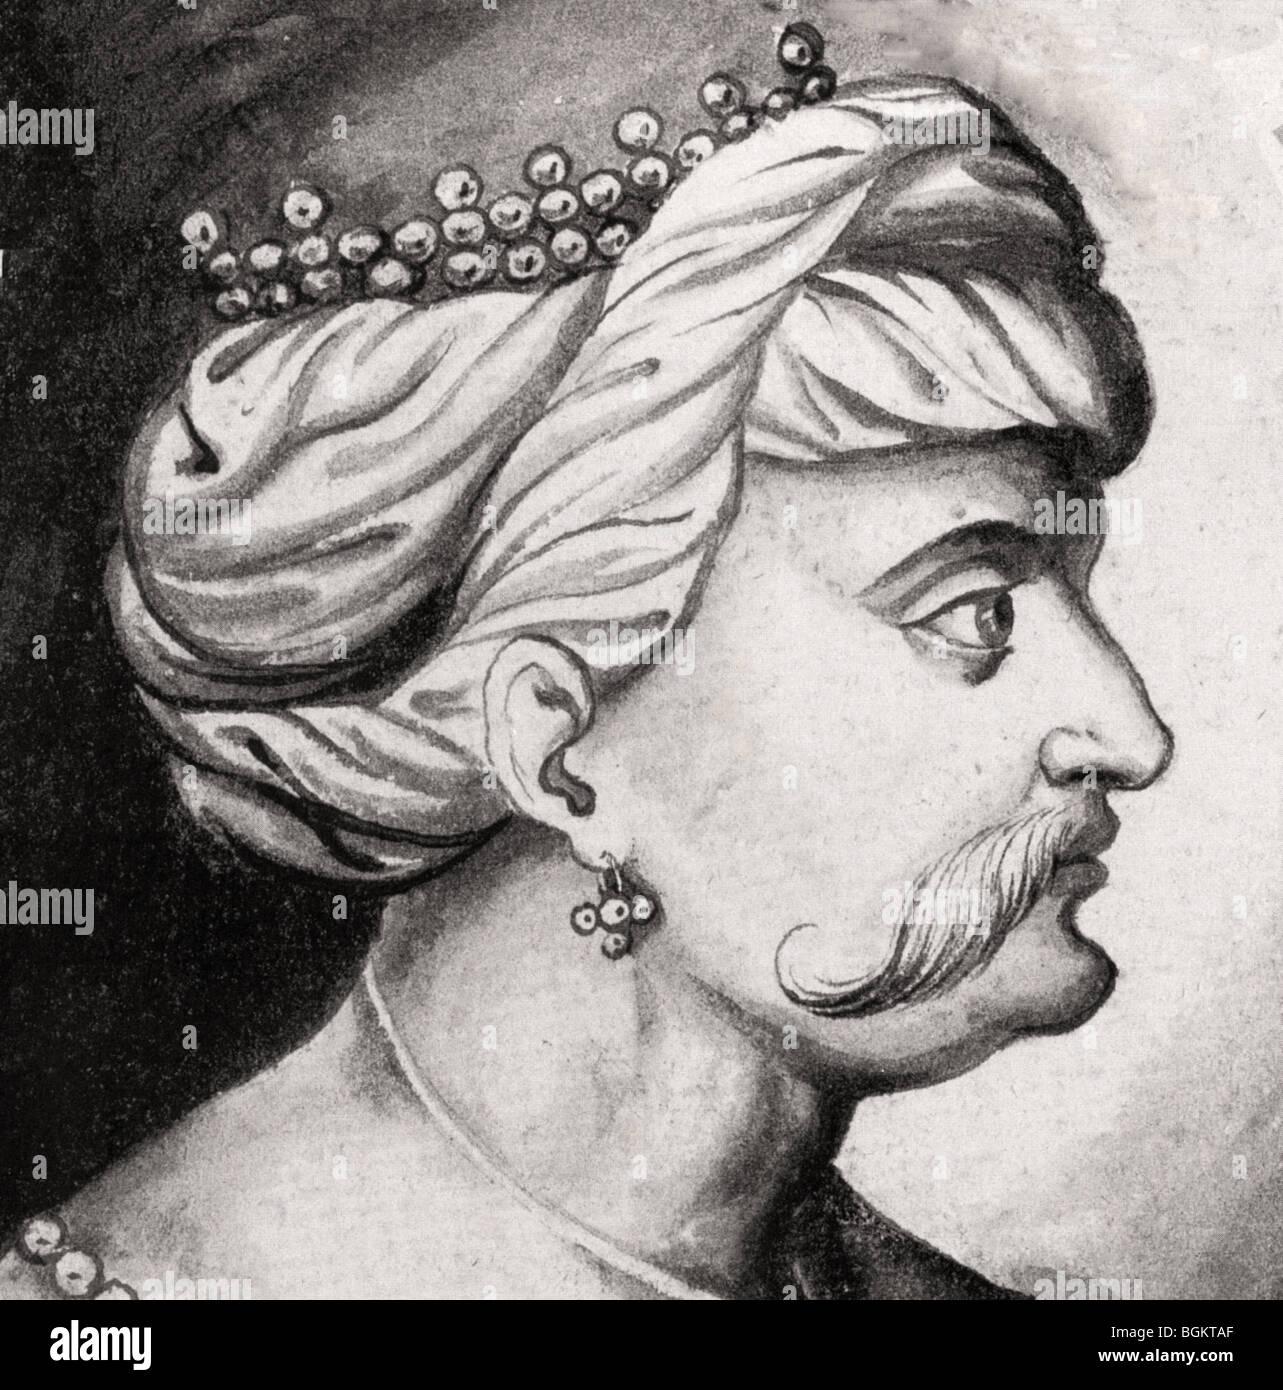 SELIM  I, THE GRIM Ottoman Sultan of Turkey (1467-1520) - Stock Image